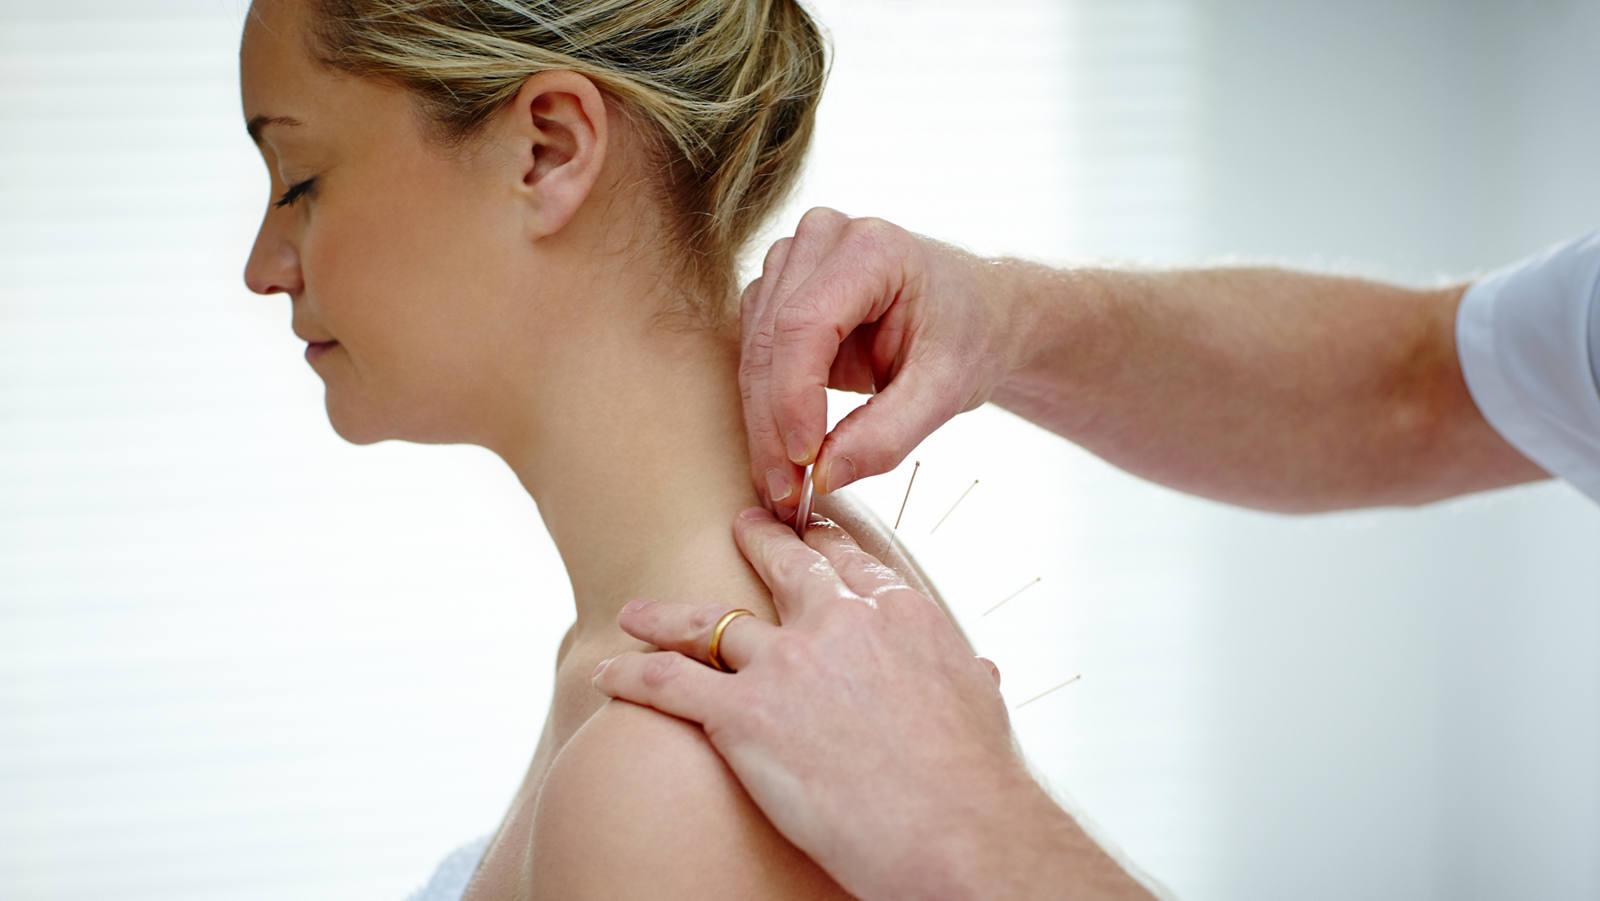 Dry Needling gegen Muskelverhärtungen